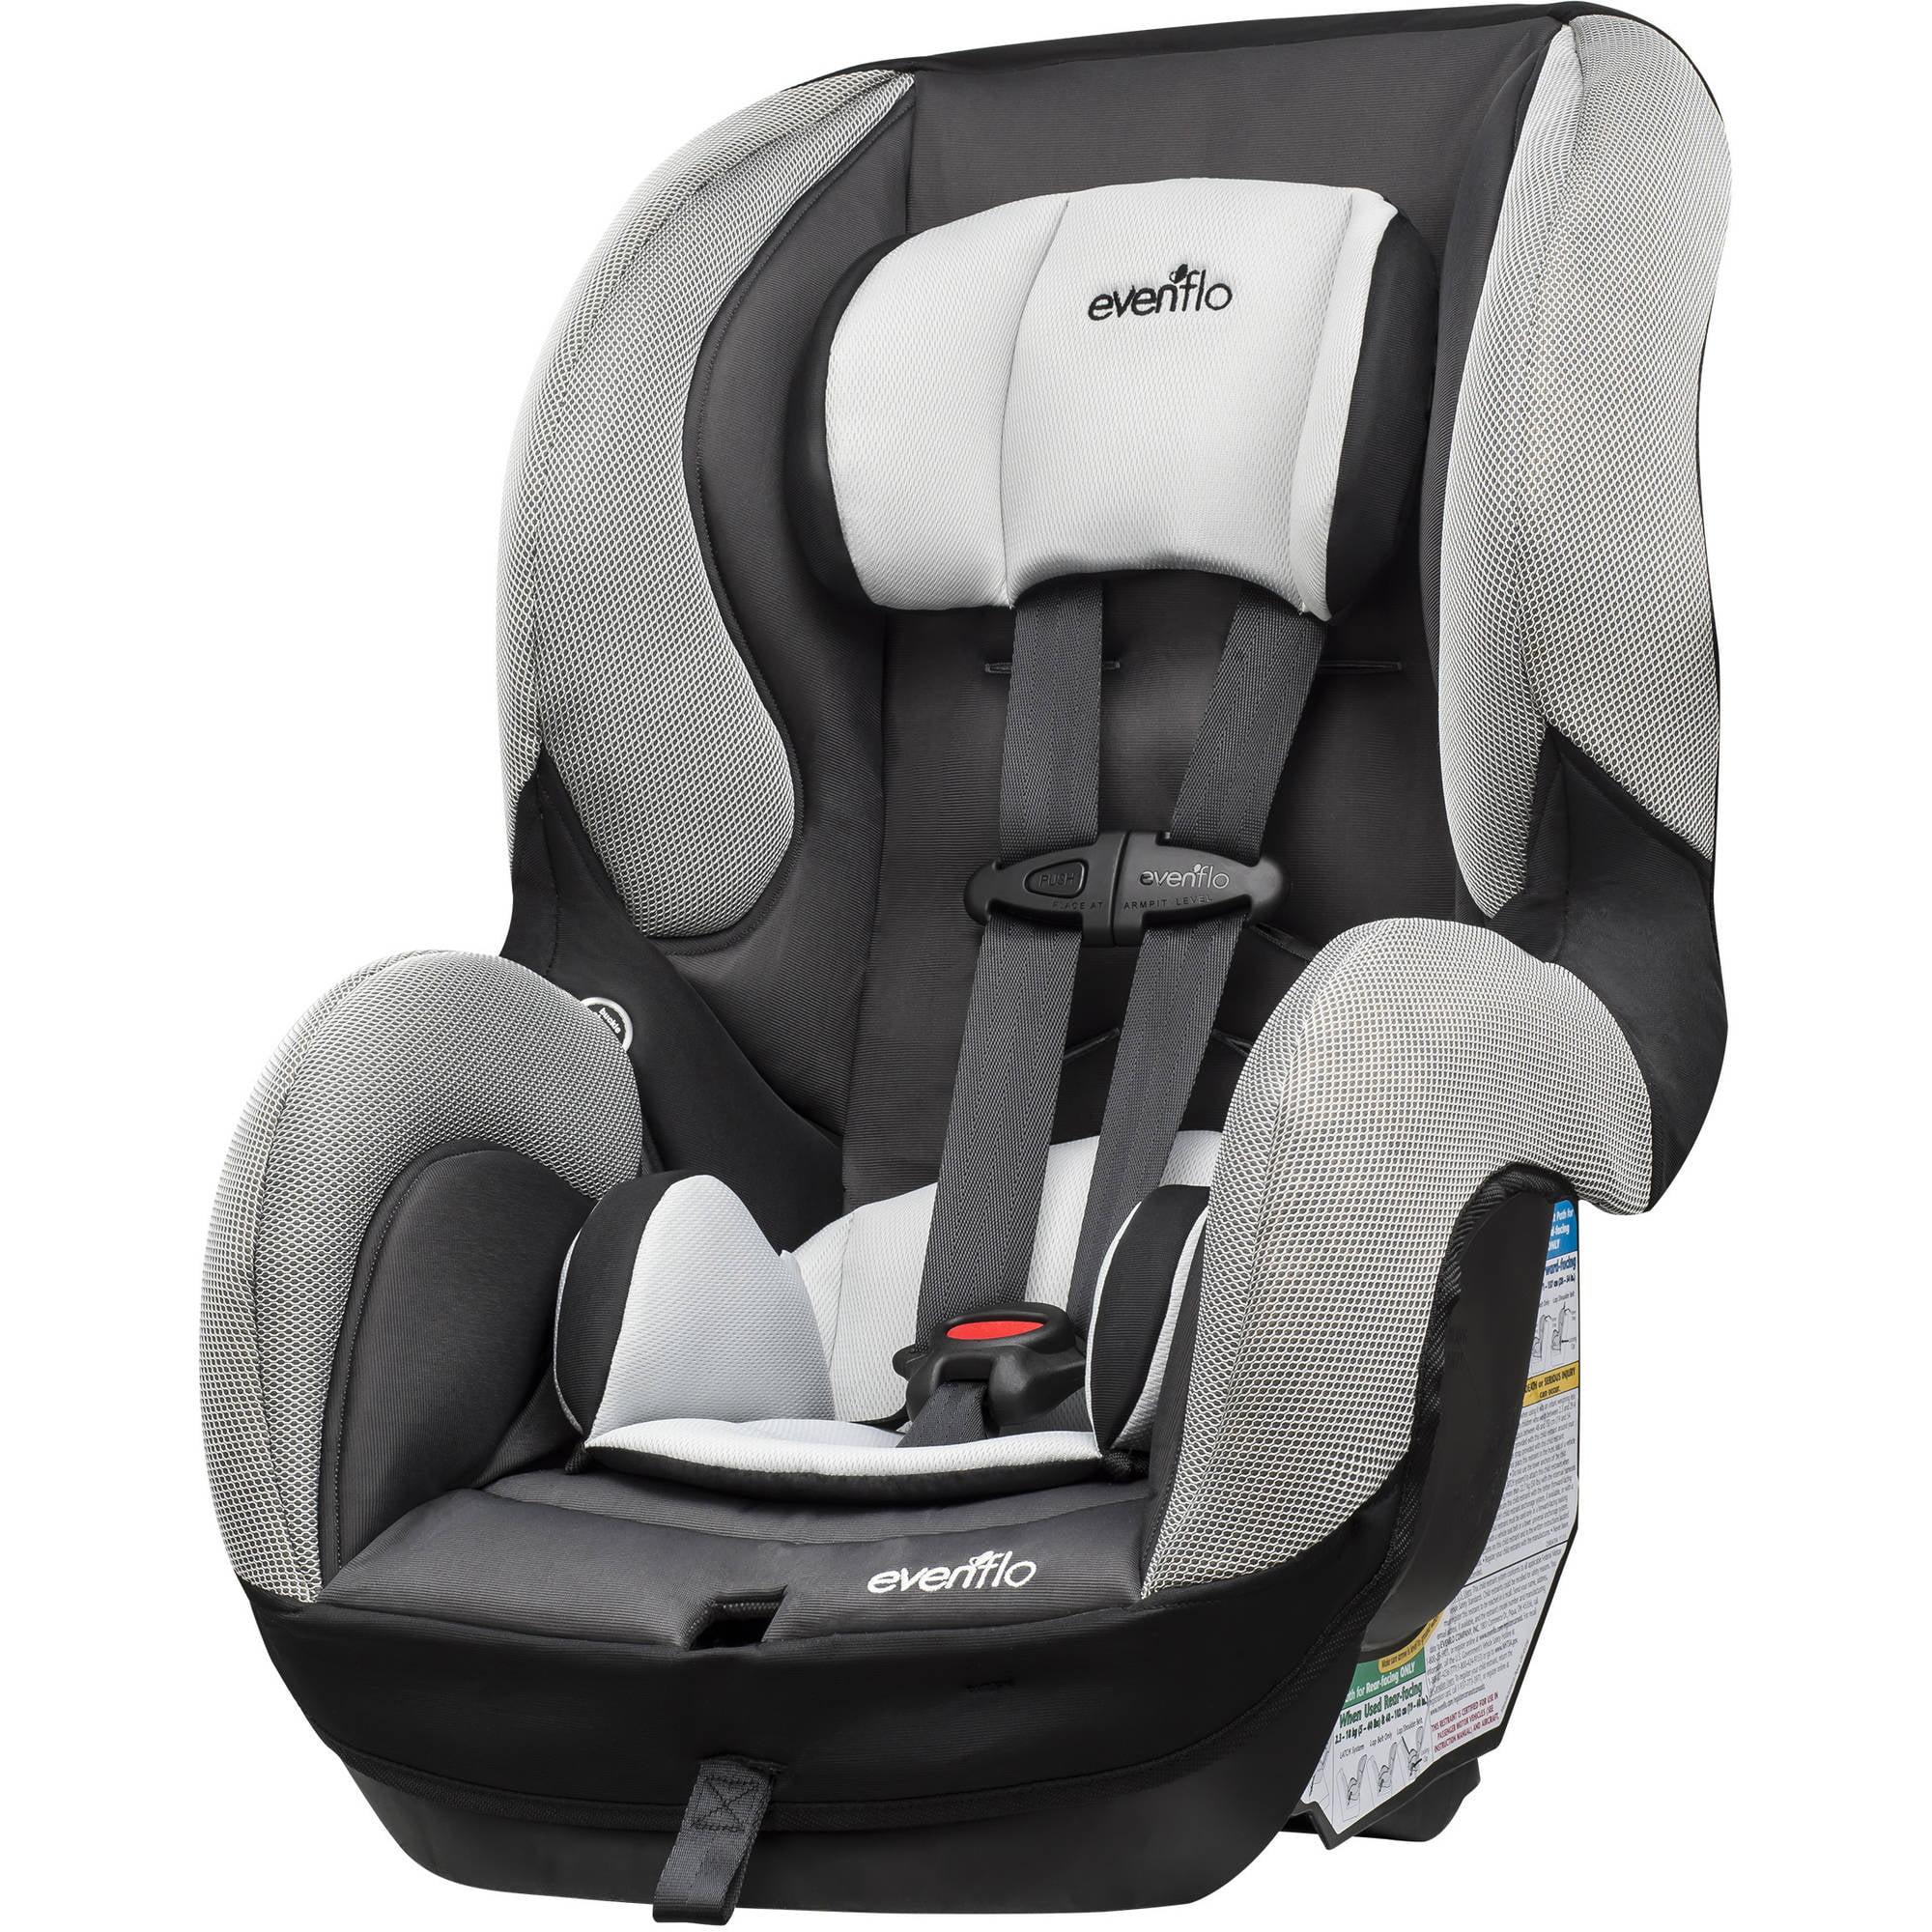 evenflo sureride dlx convertible car seat paxton walmart com rh walmart com evenflo car seat manual symphony evenflo car seat user manual